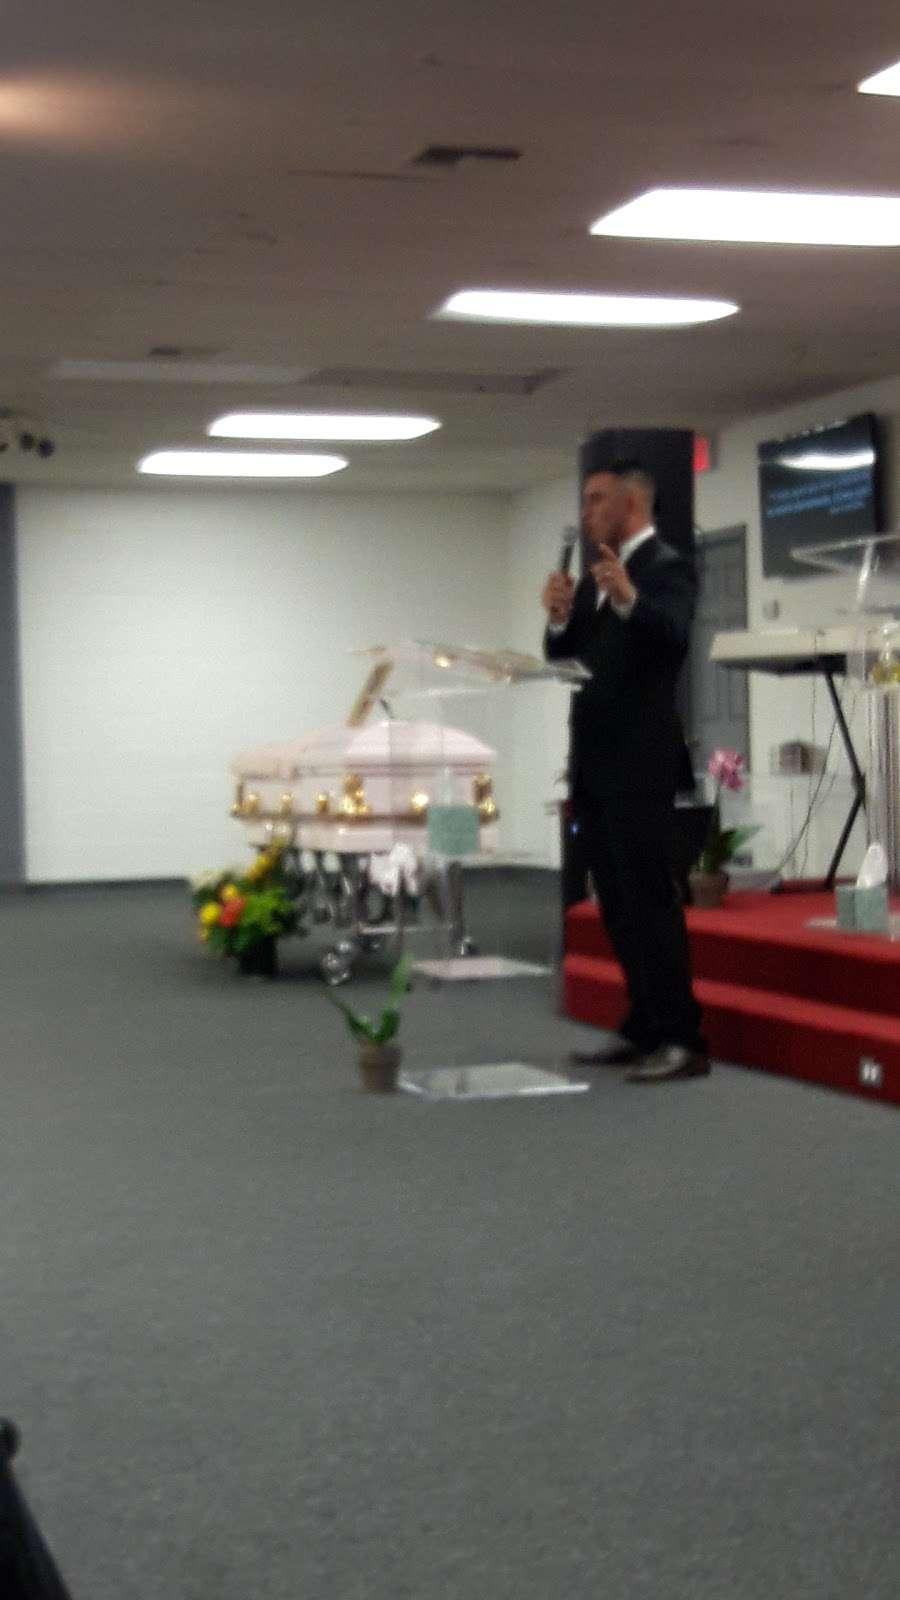 Iglesia Cristiana Pan De Vida Cristian church - church  | Photo 9 of 10 | Address: 2506 W Mt Houston Rd, Houston, TX 77038, USA | Phone: (832) 953-6611